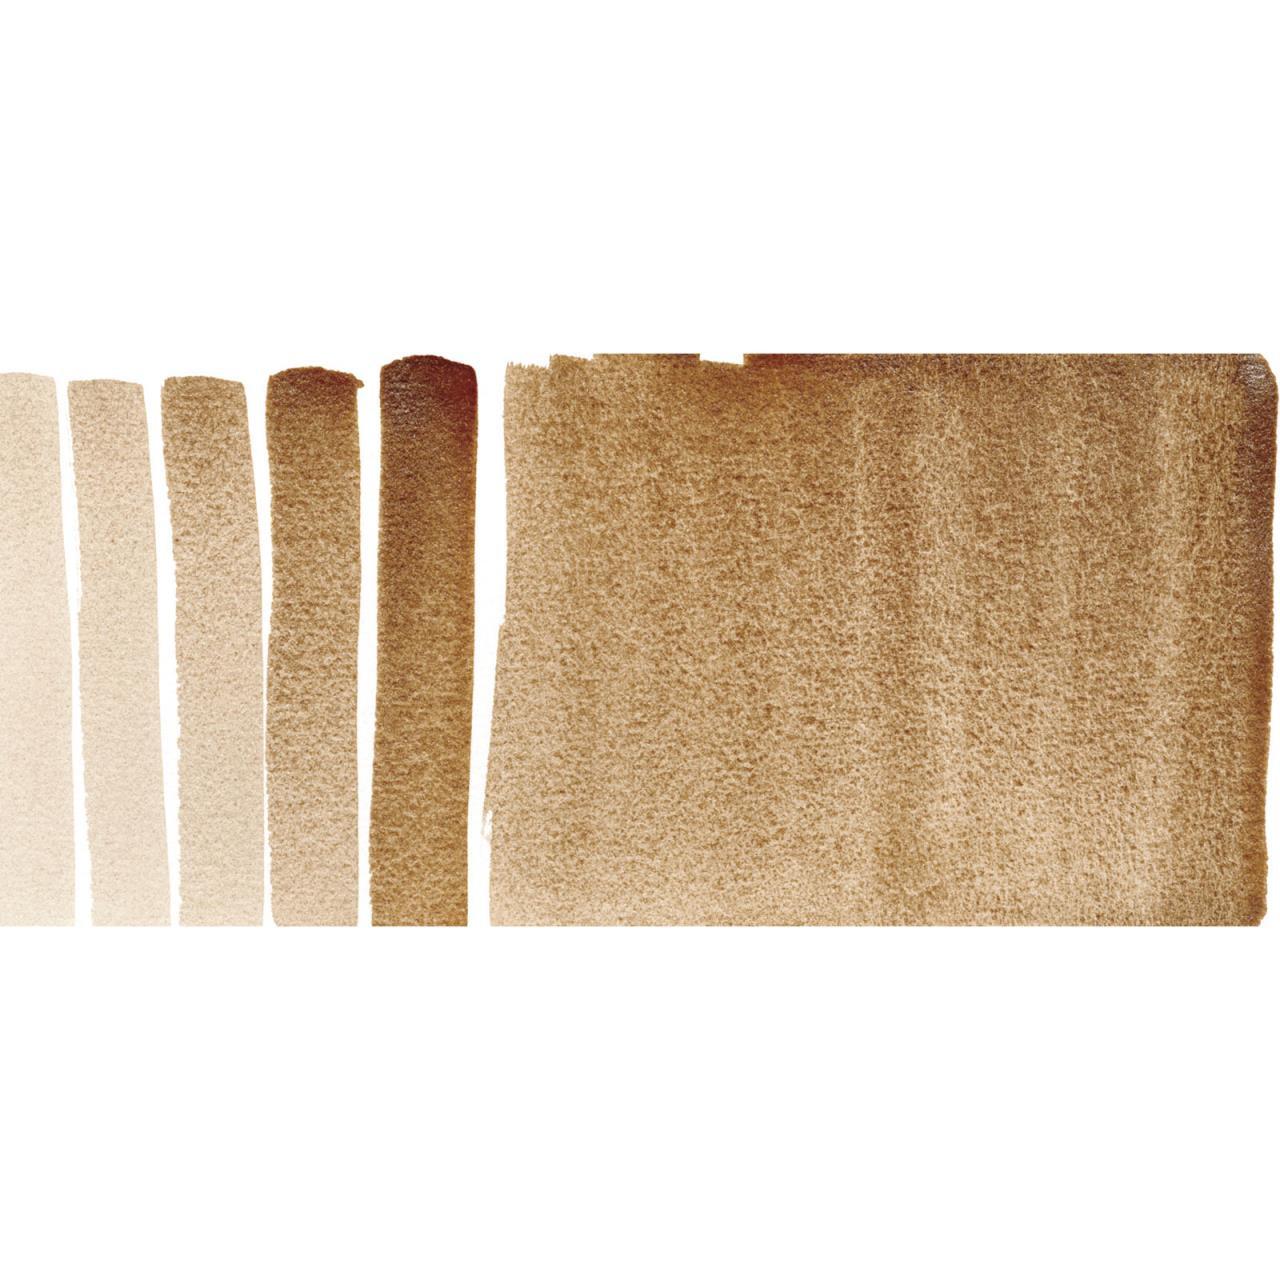 Bronzite Genuine (PrimaTek), DANIEL SMITH Extra Fine Watercolors 15ml Tubes -